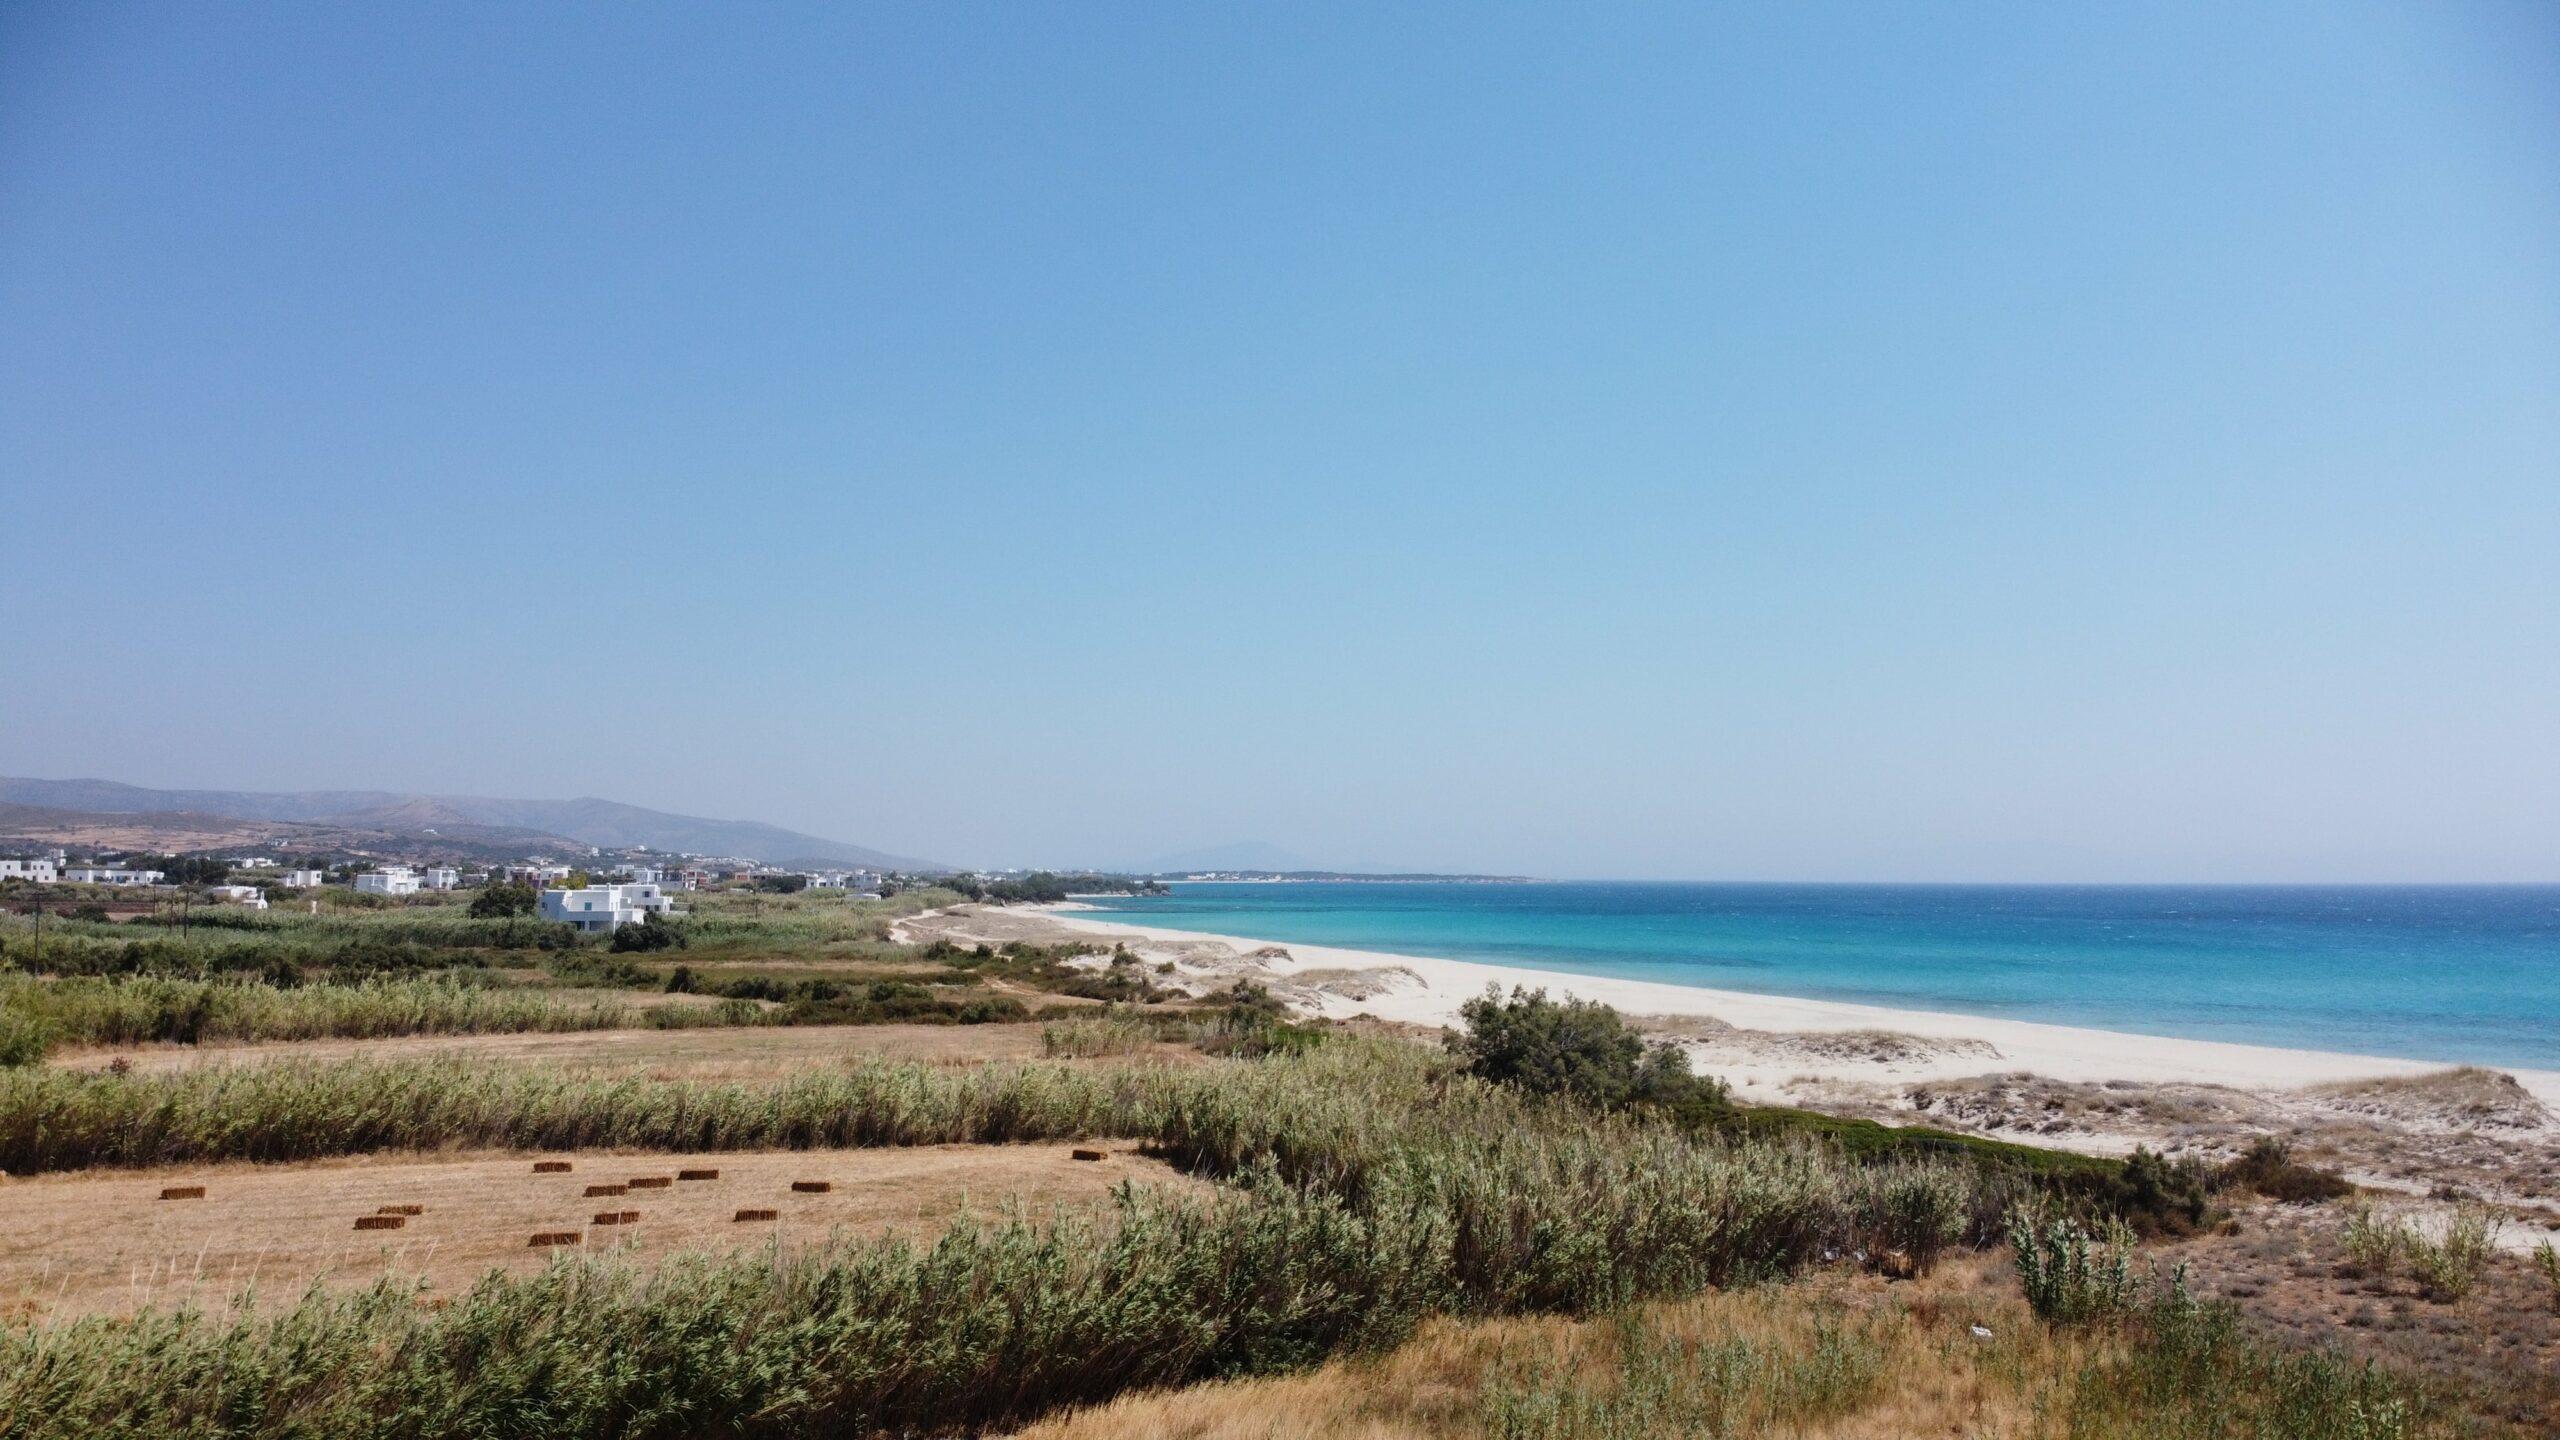 Terrain Naxos  -  ref GR-6159-S (picture 3)